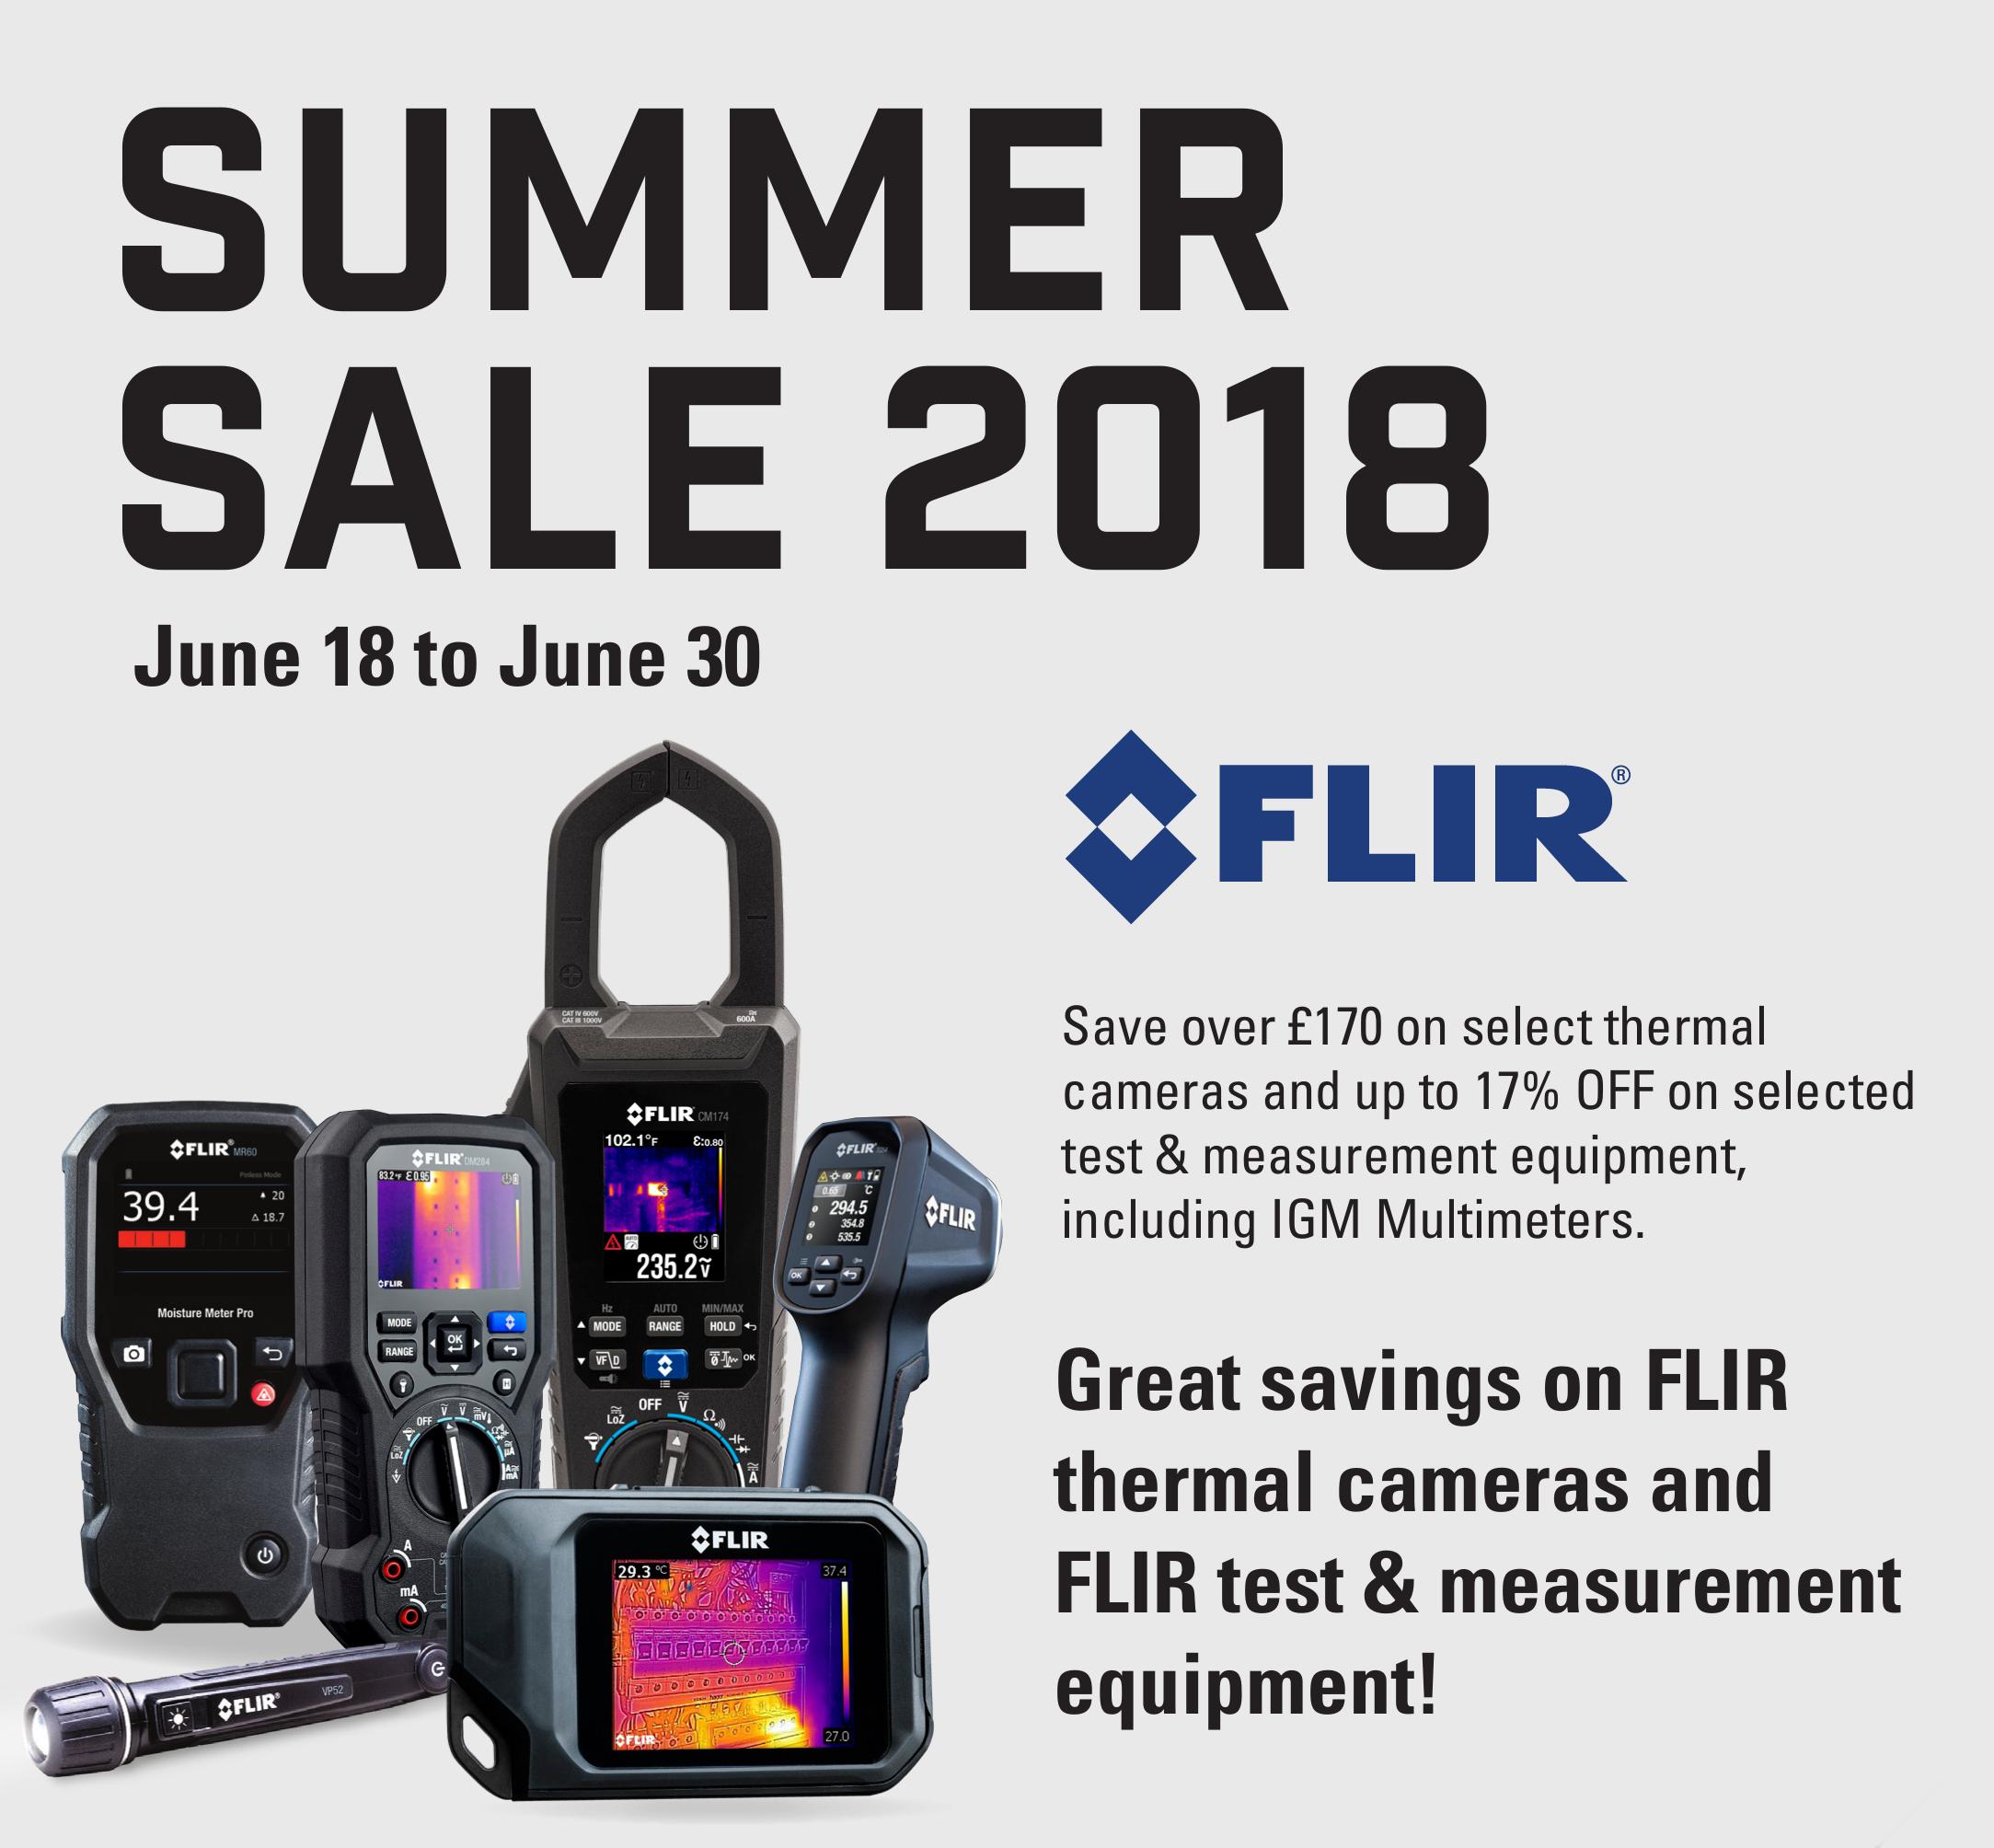 News Image: /Content/uploadedImagesFLIR_Summer_Sale_2018.jpg